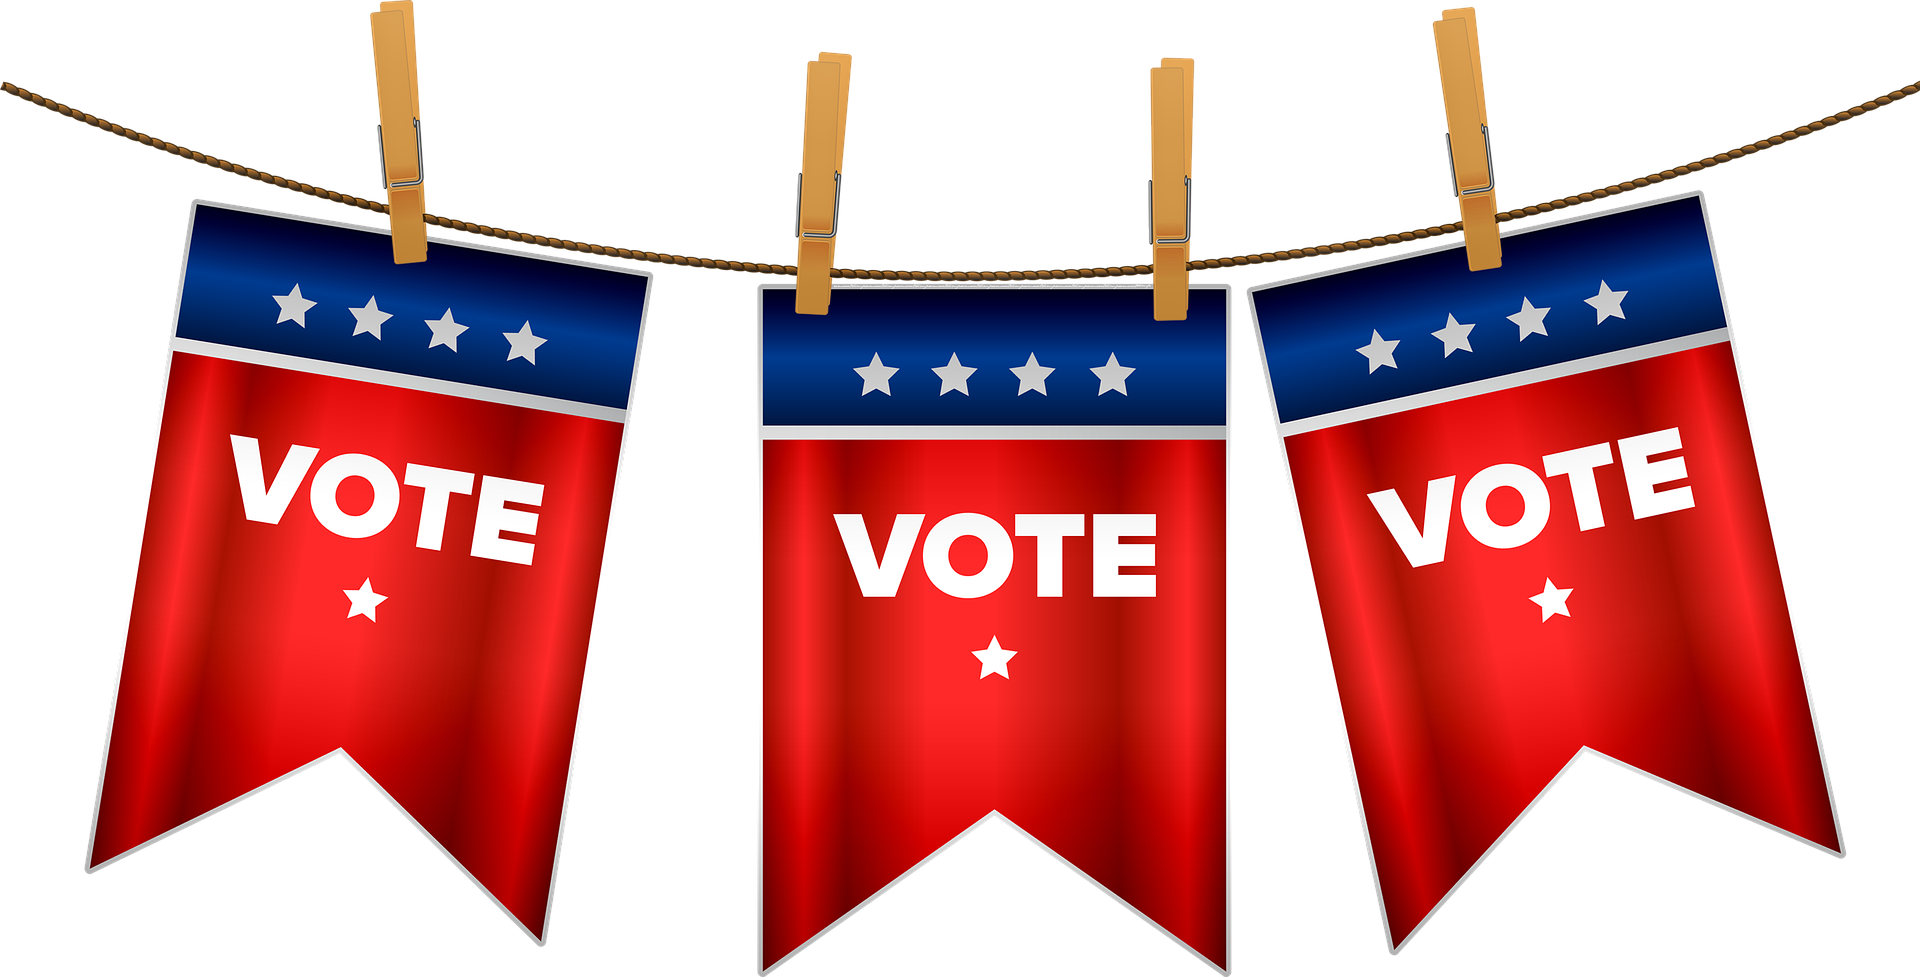 vote_vote_vote.png